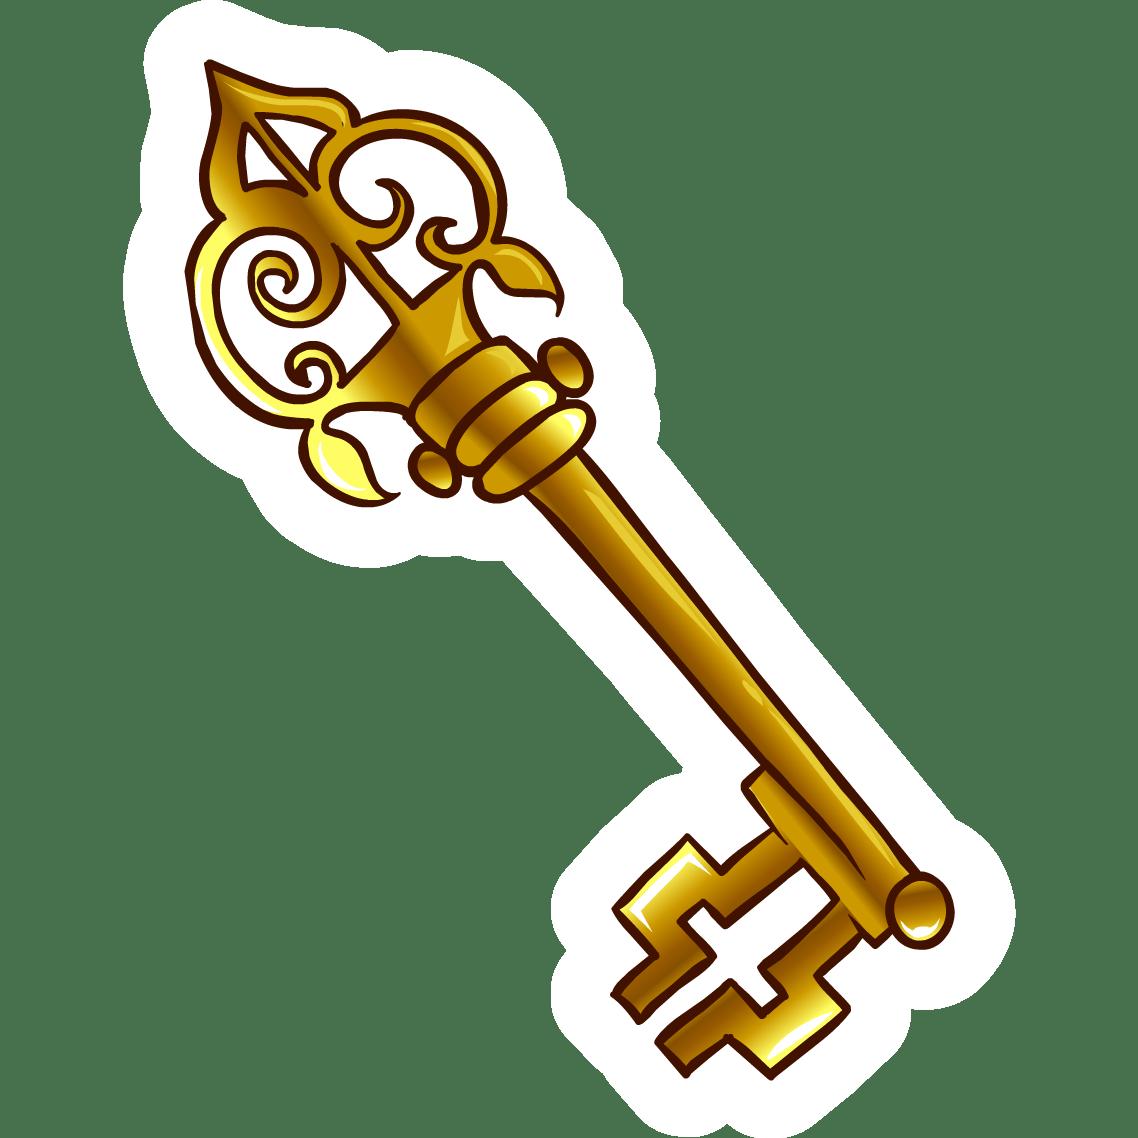 Keys clipart old fashioned. Gambar key gold pencil